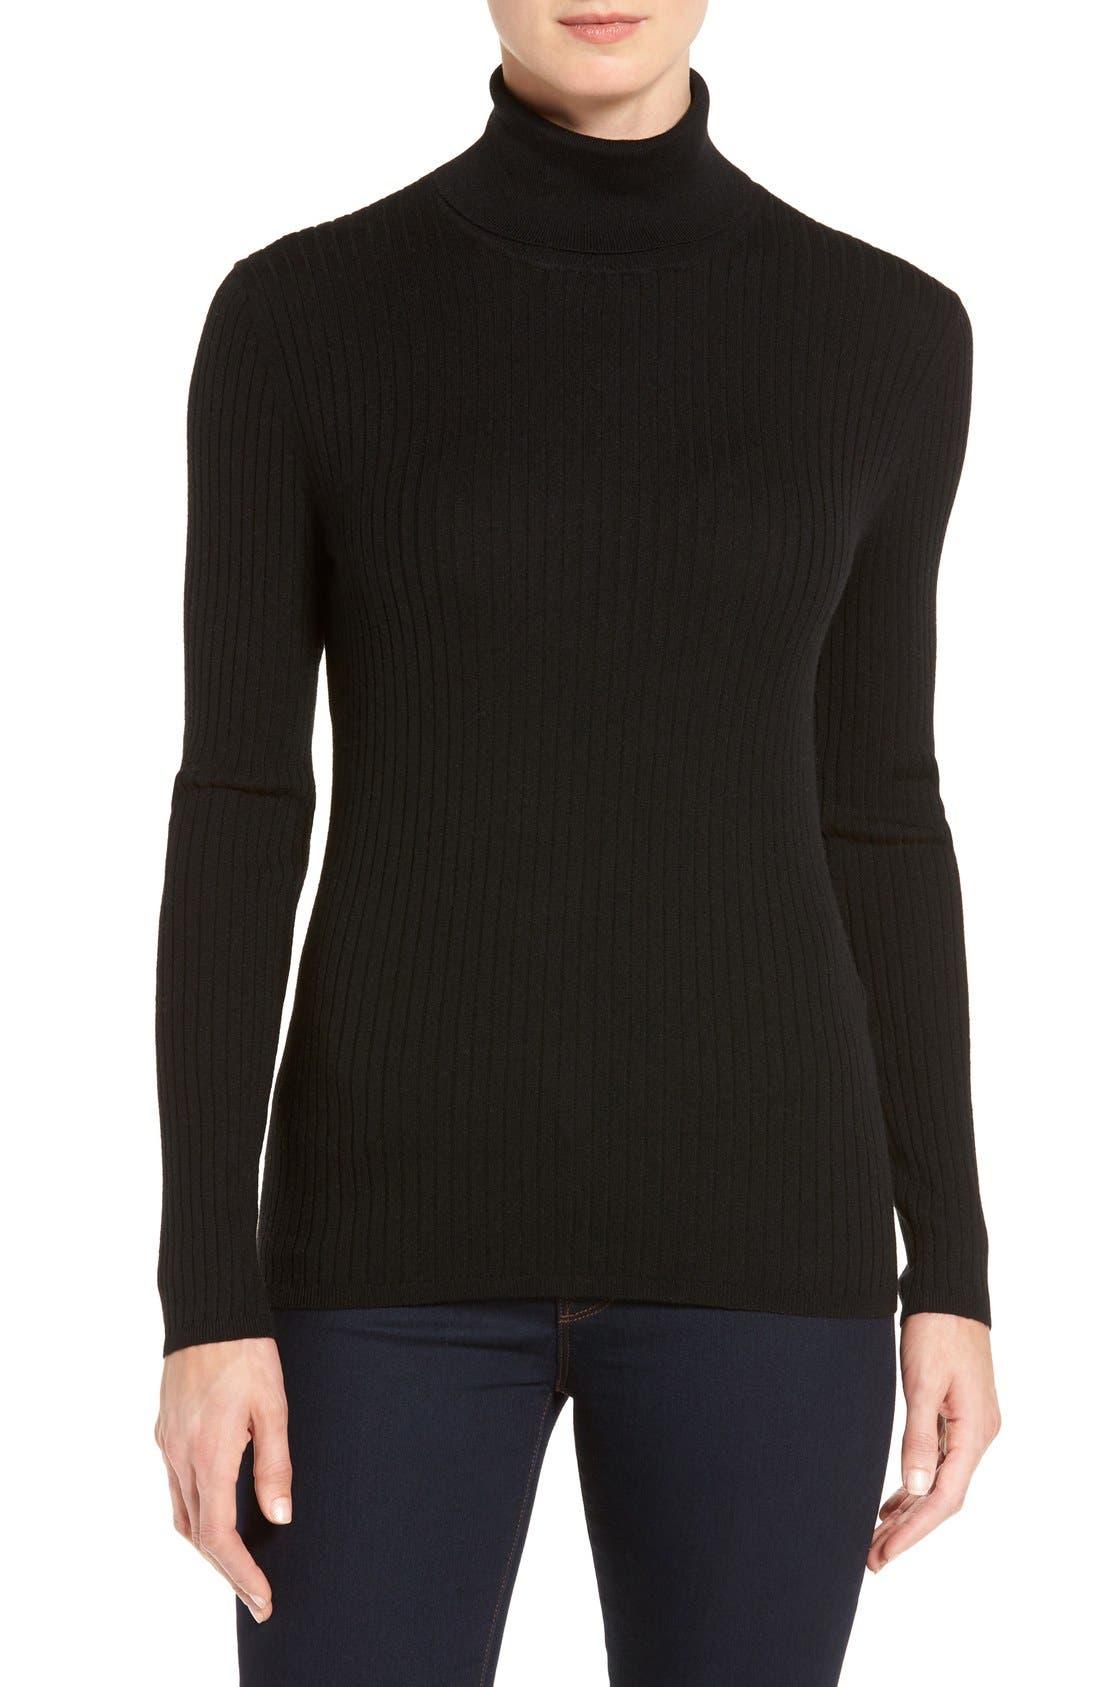 Alternate Image 1 Selected - Classiques Entier® Ribbed Turtleneck Sweater (Regular & Petite)